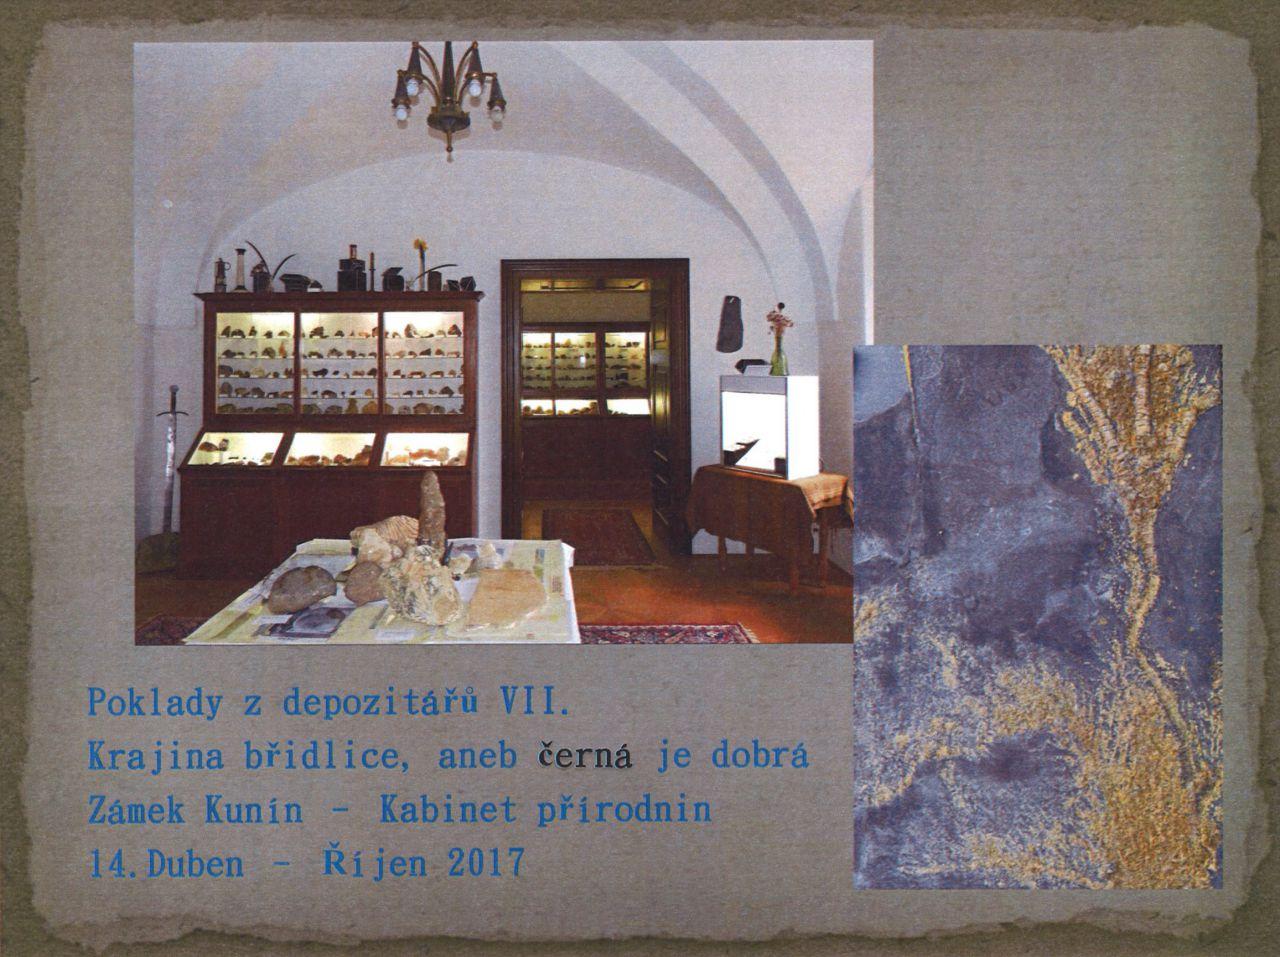 Poklady z depozitářů VII.